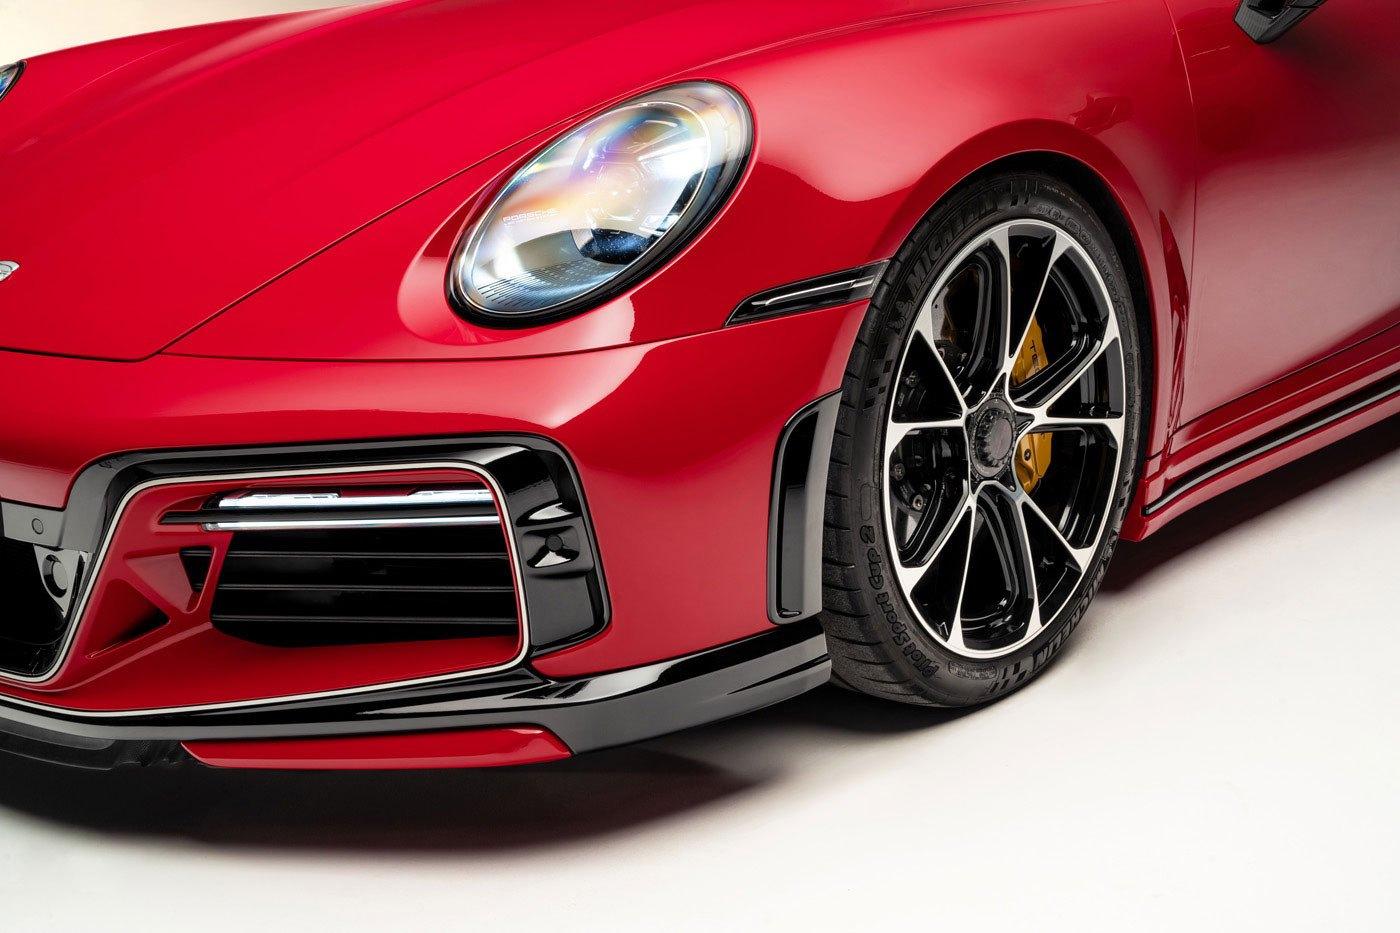 2021_Porsche_911_Turbo_S_by_TechArt_0004